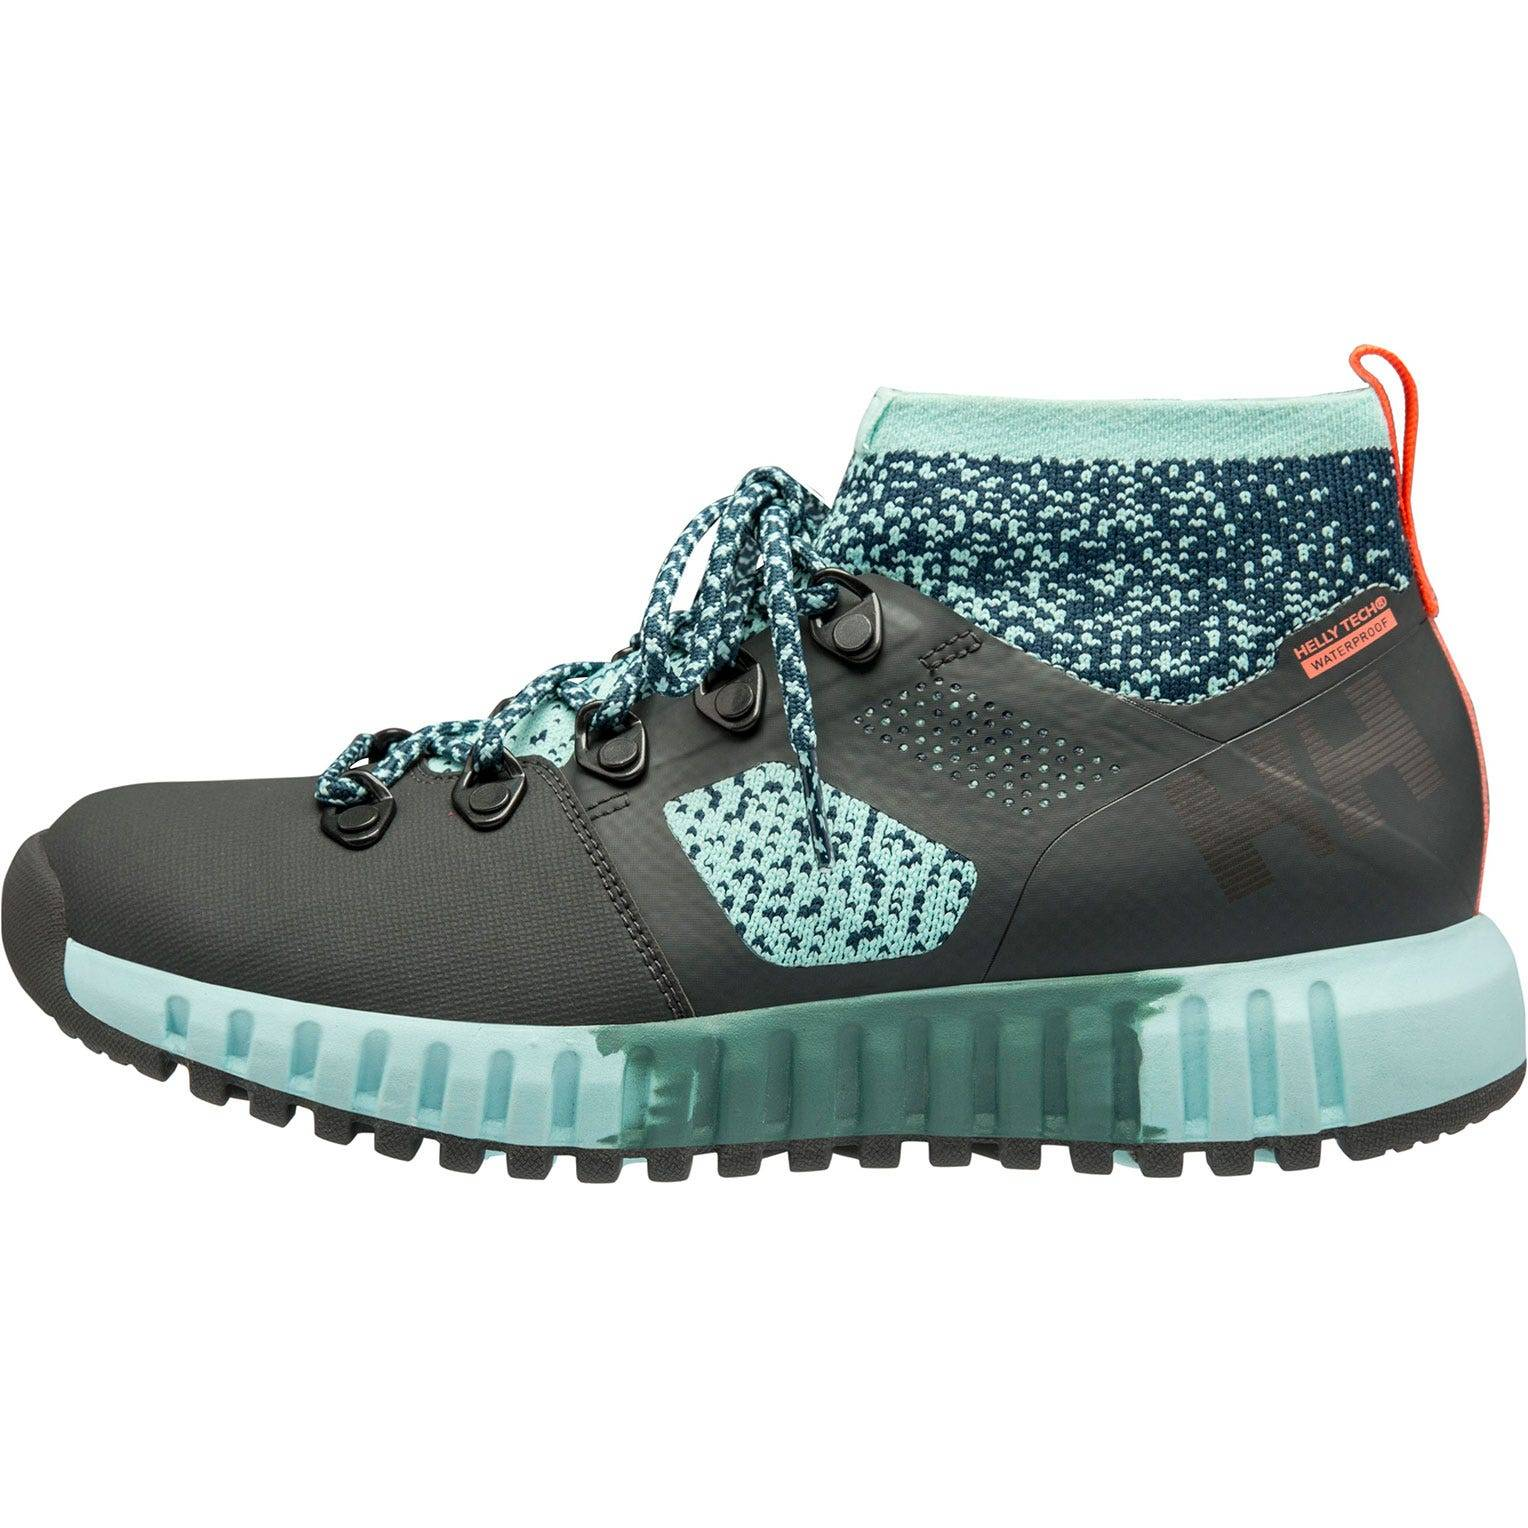 Helly Hansen W Vanir Canter Ht Womens Hiking Boot Black 38/7